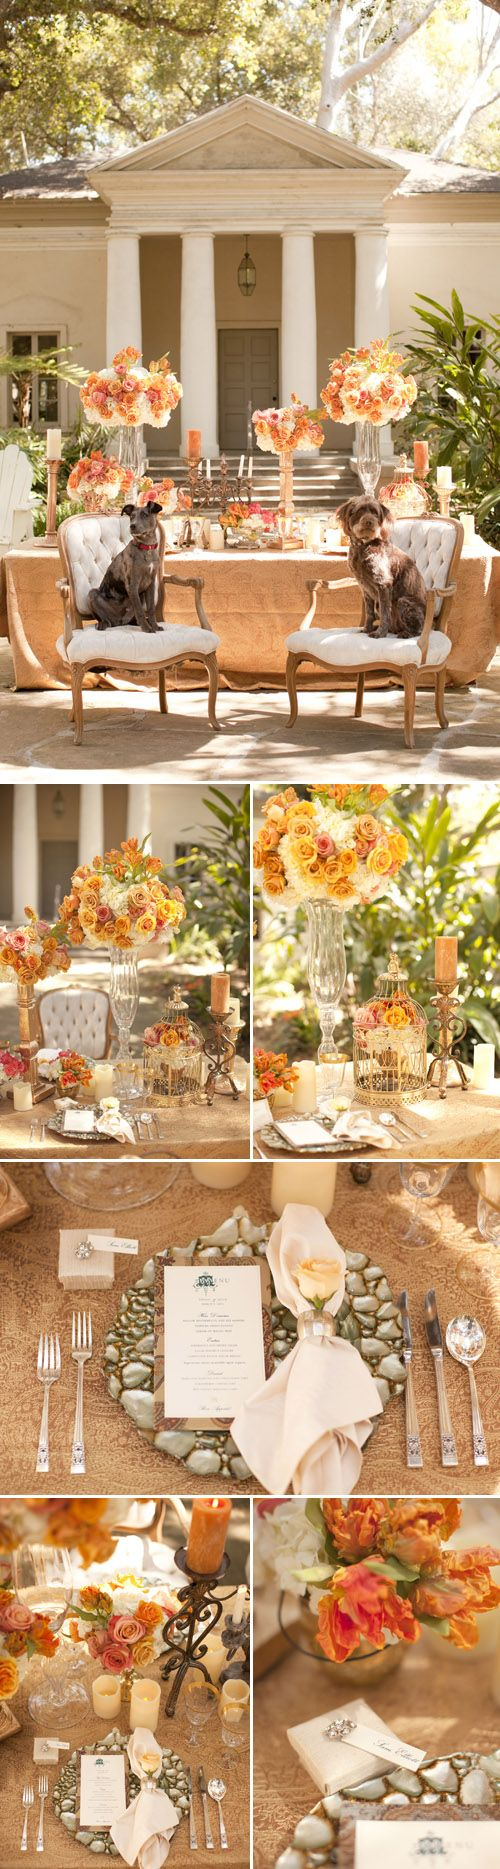 Coral flower arrangements brighten up this white wedding, photo by Allyson Magda